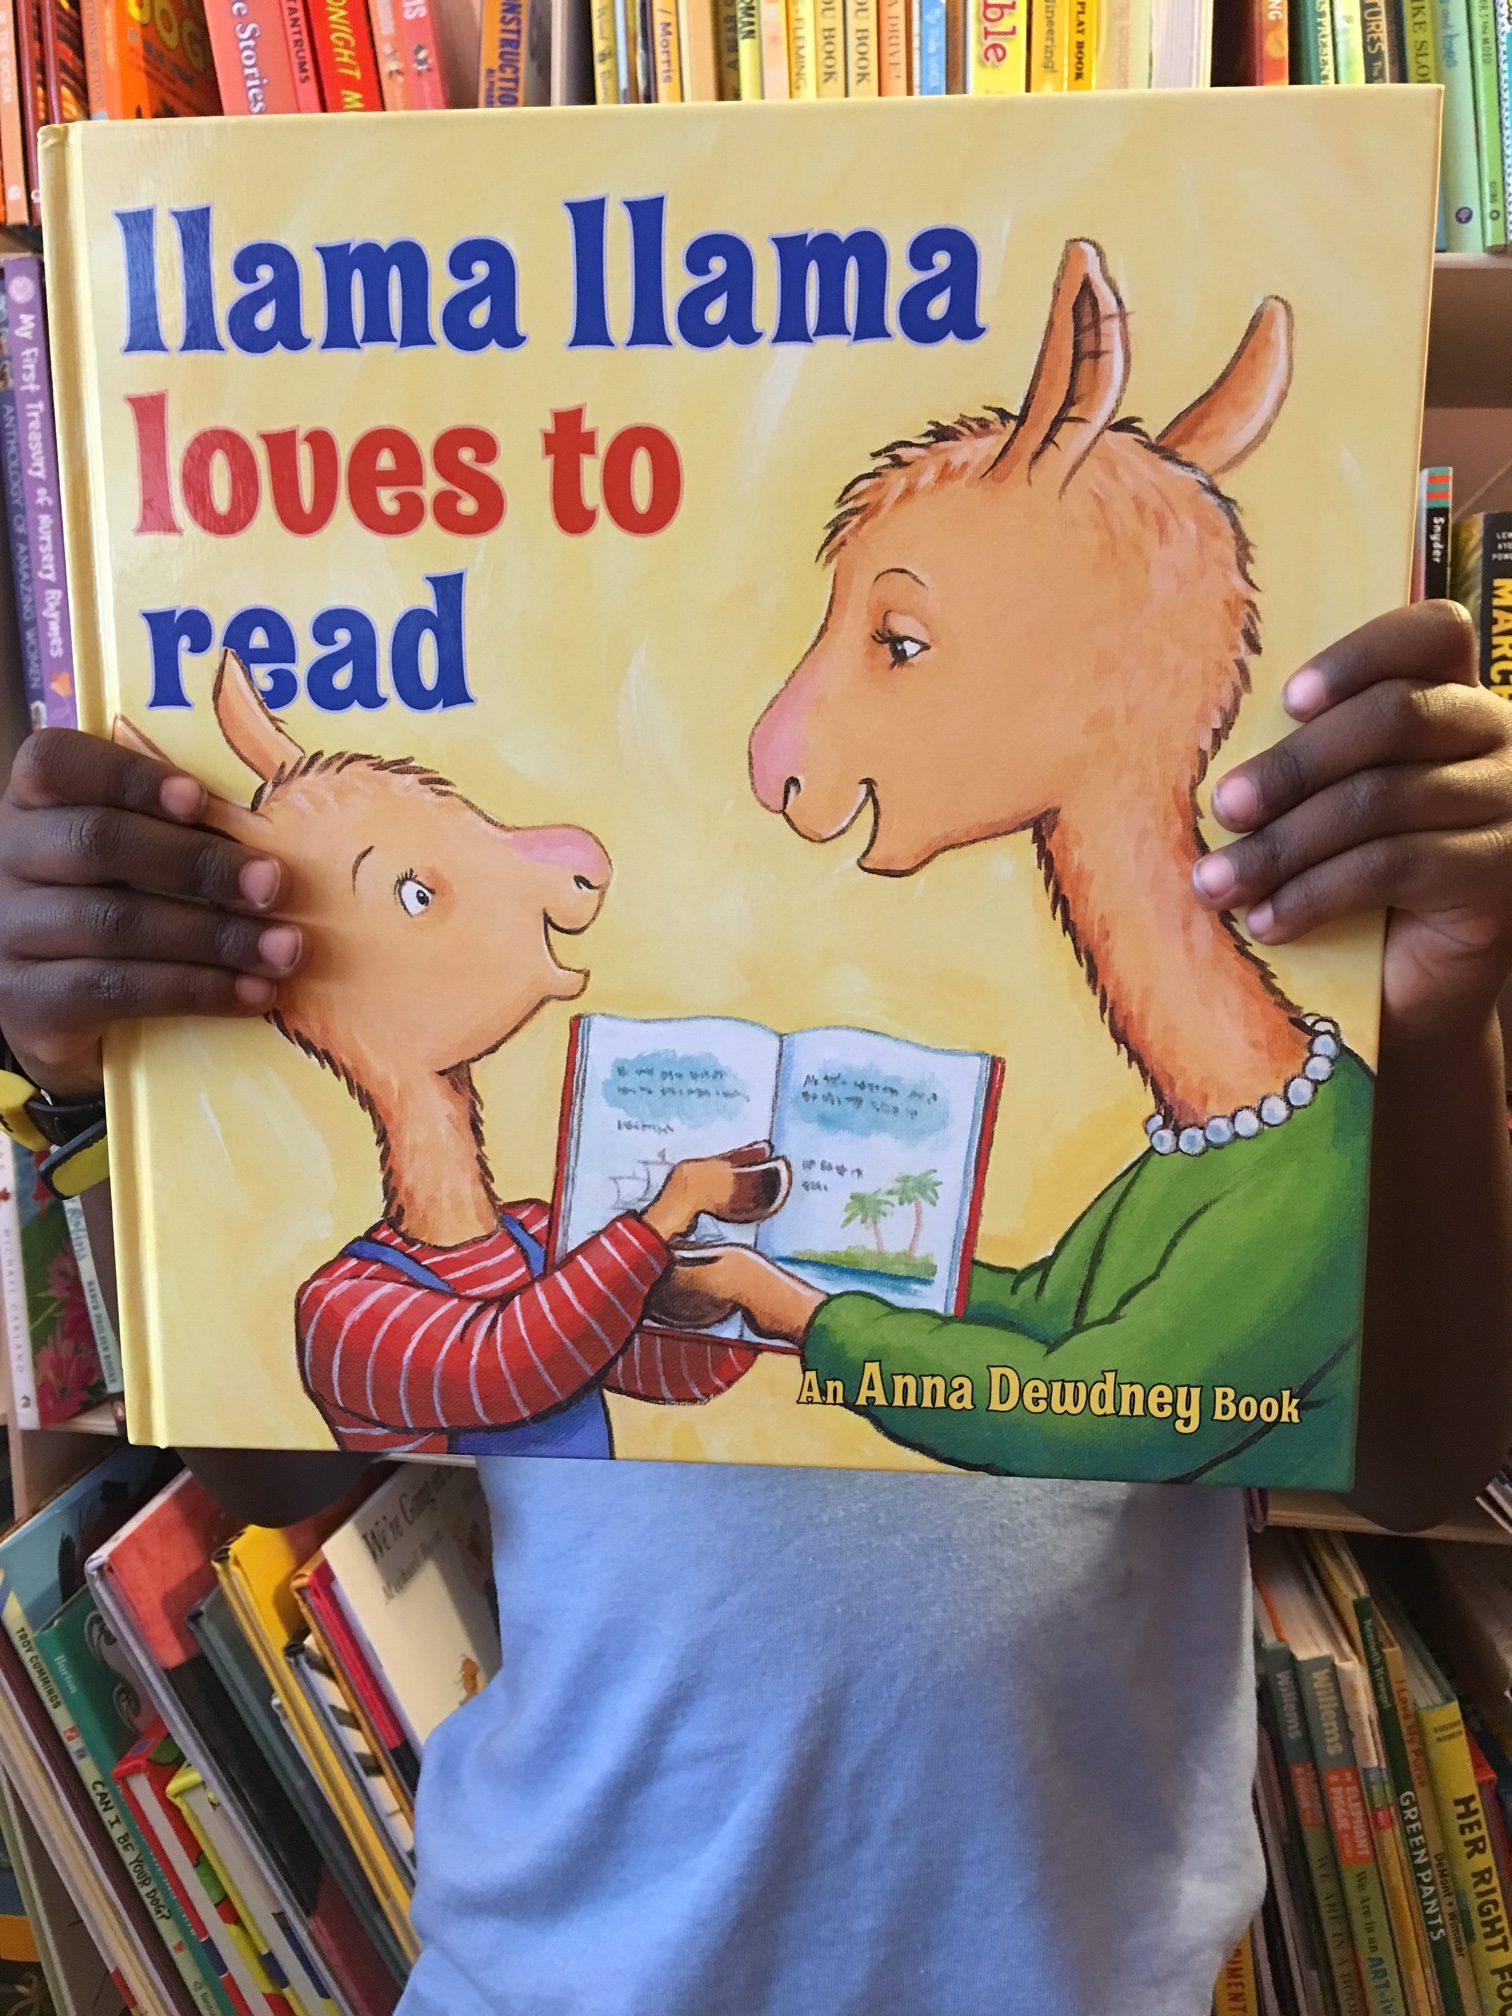 Llama Llama Loves to Read Blog Tour